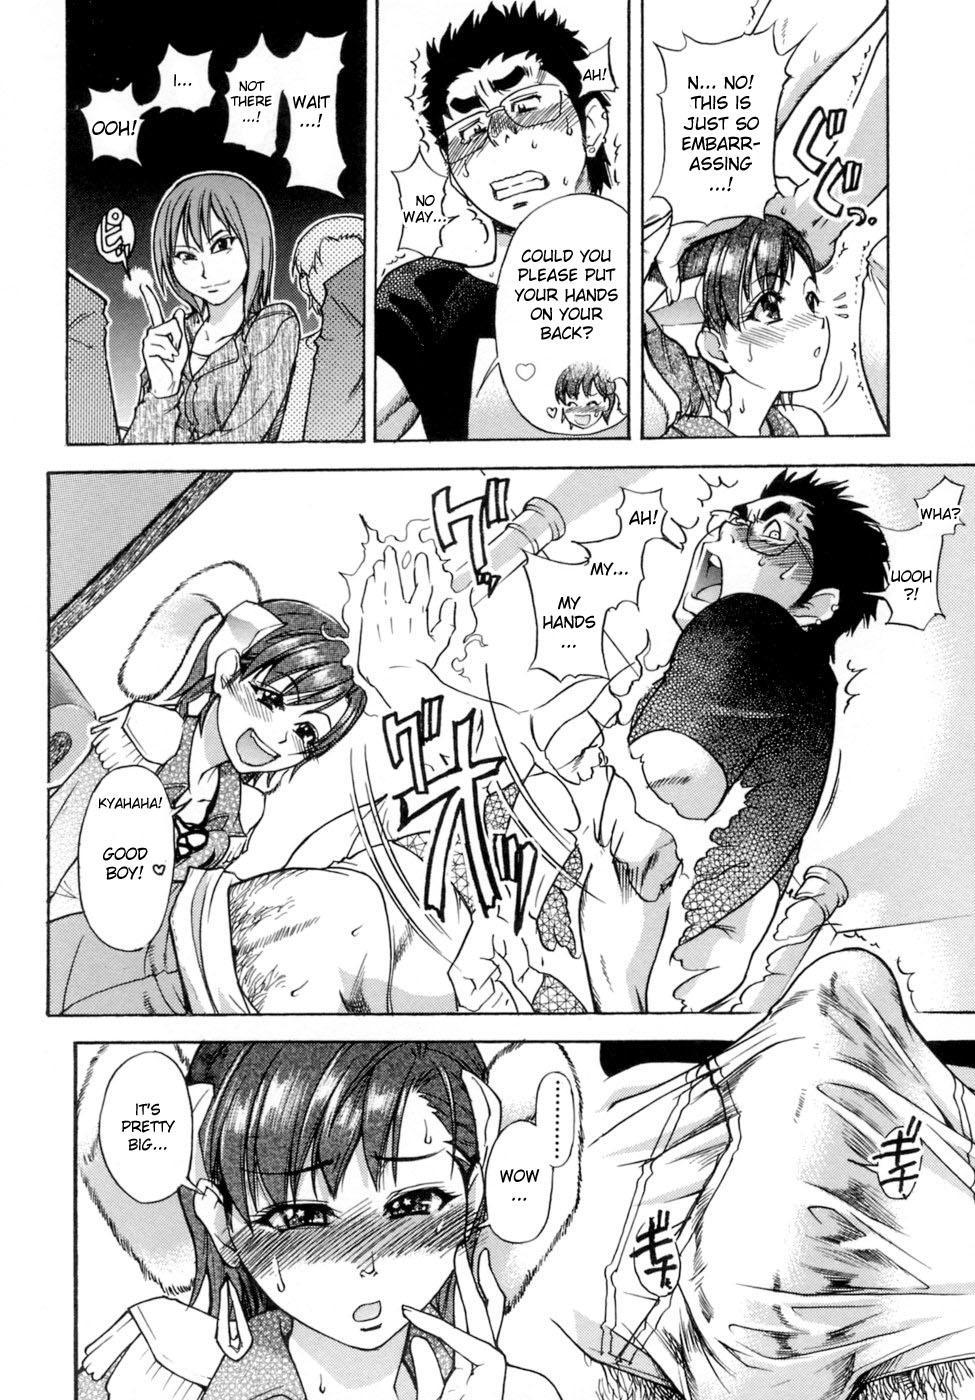 Shining Musume. 5. Five Sense of Love 91